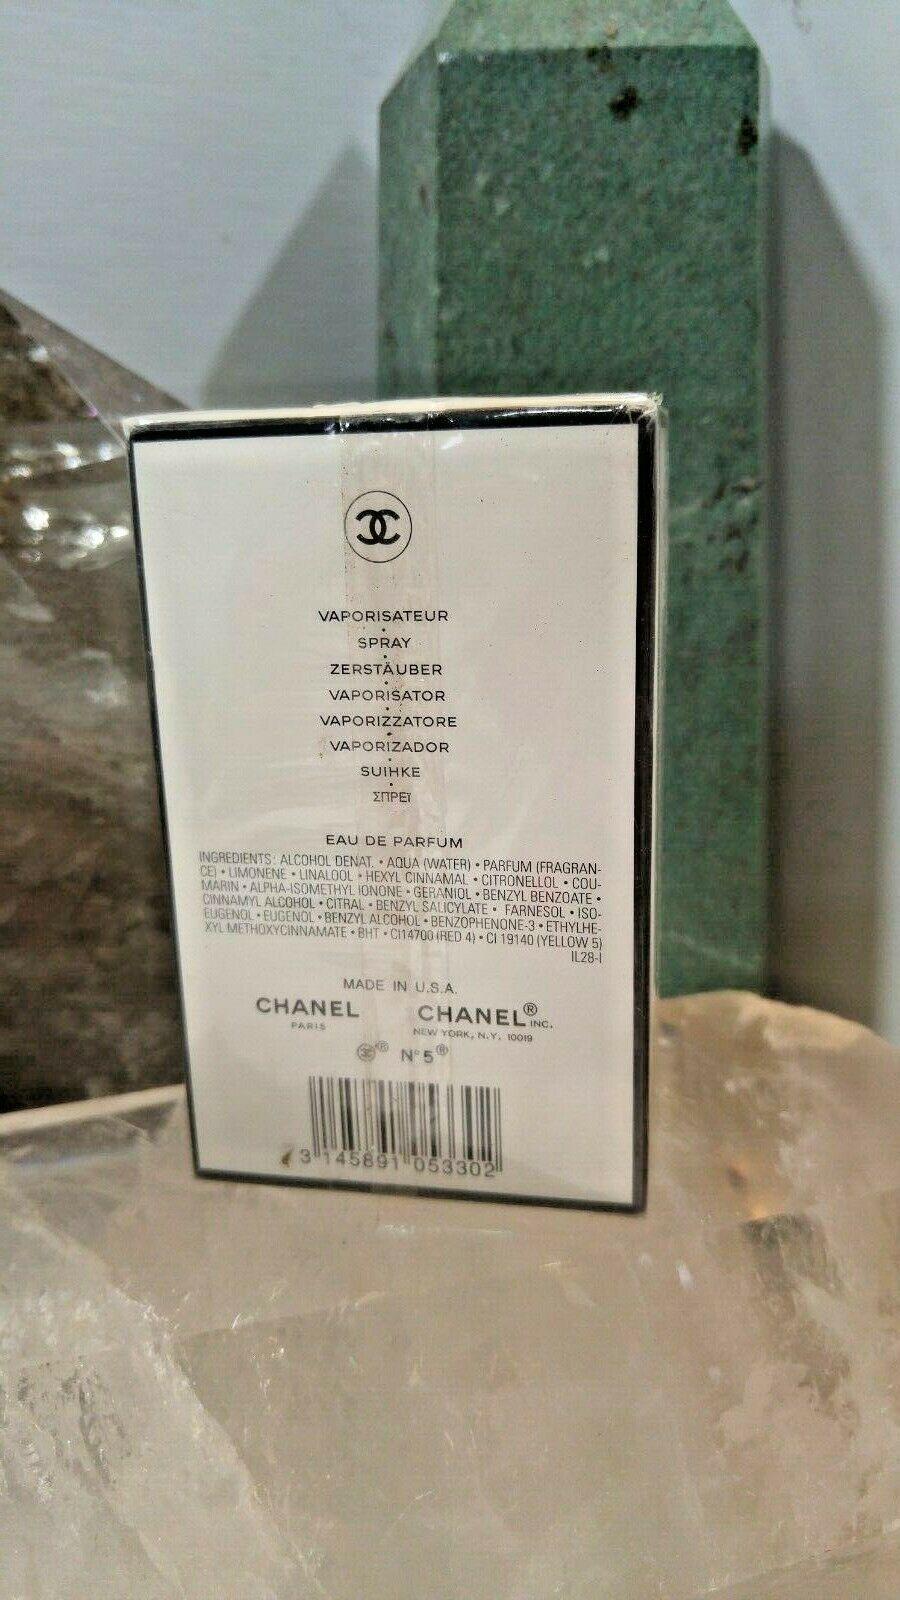 Chanel N°5 Eau Premiére Womens Perfume Full Size 1.7 fl. oz. SEALED